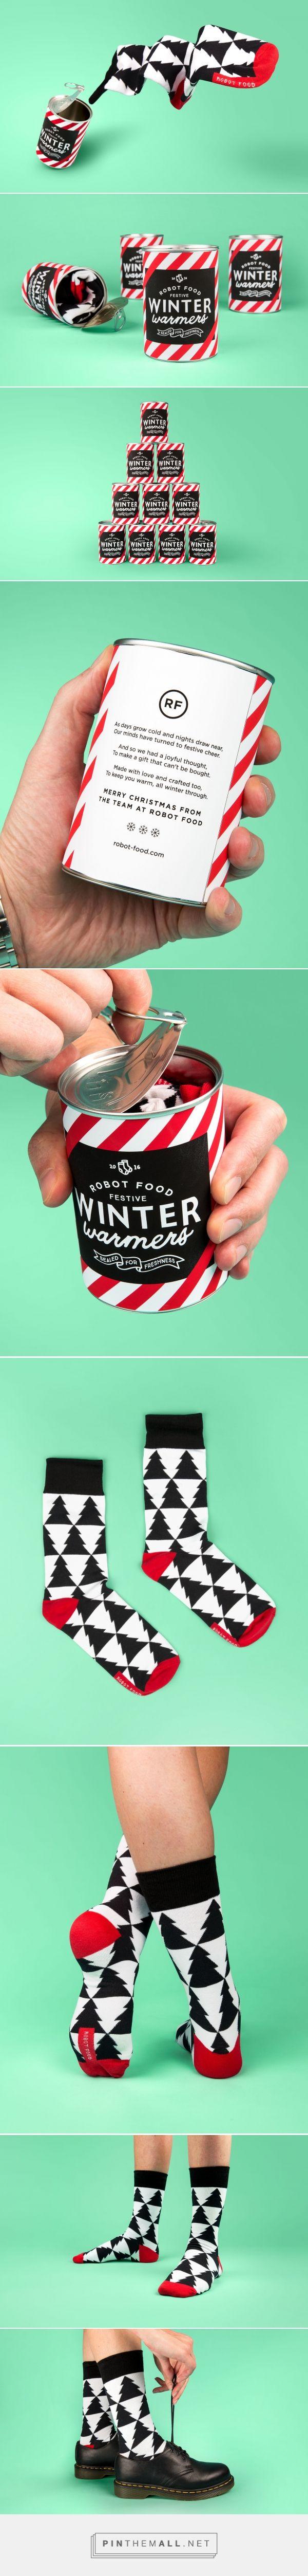 67 best Make Merry Packaging images on Pinterest | Gift ideas ...